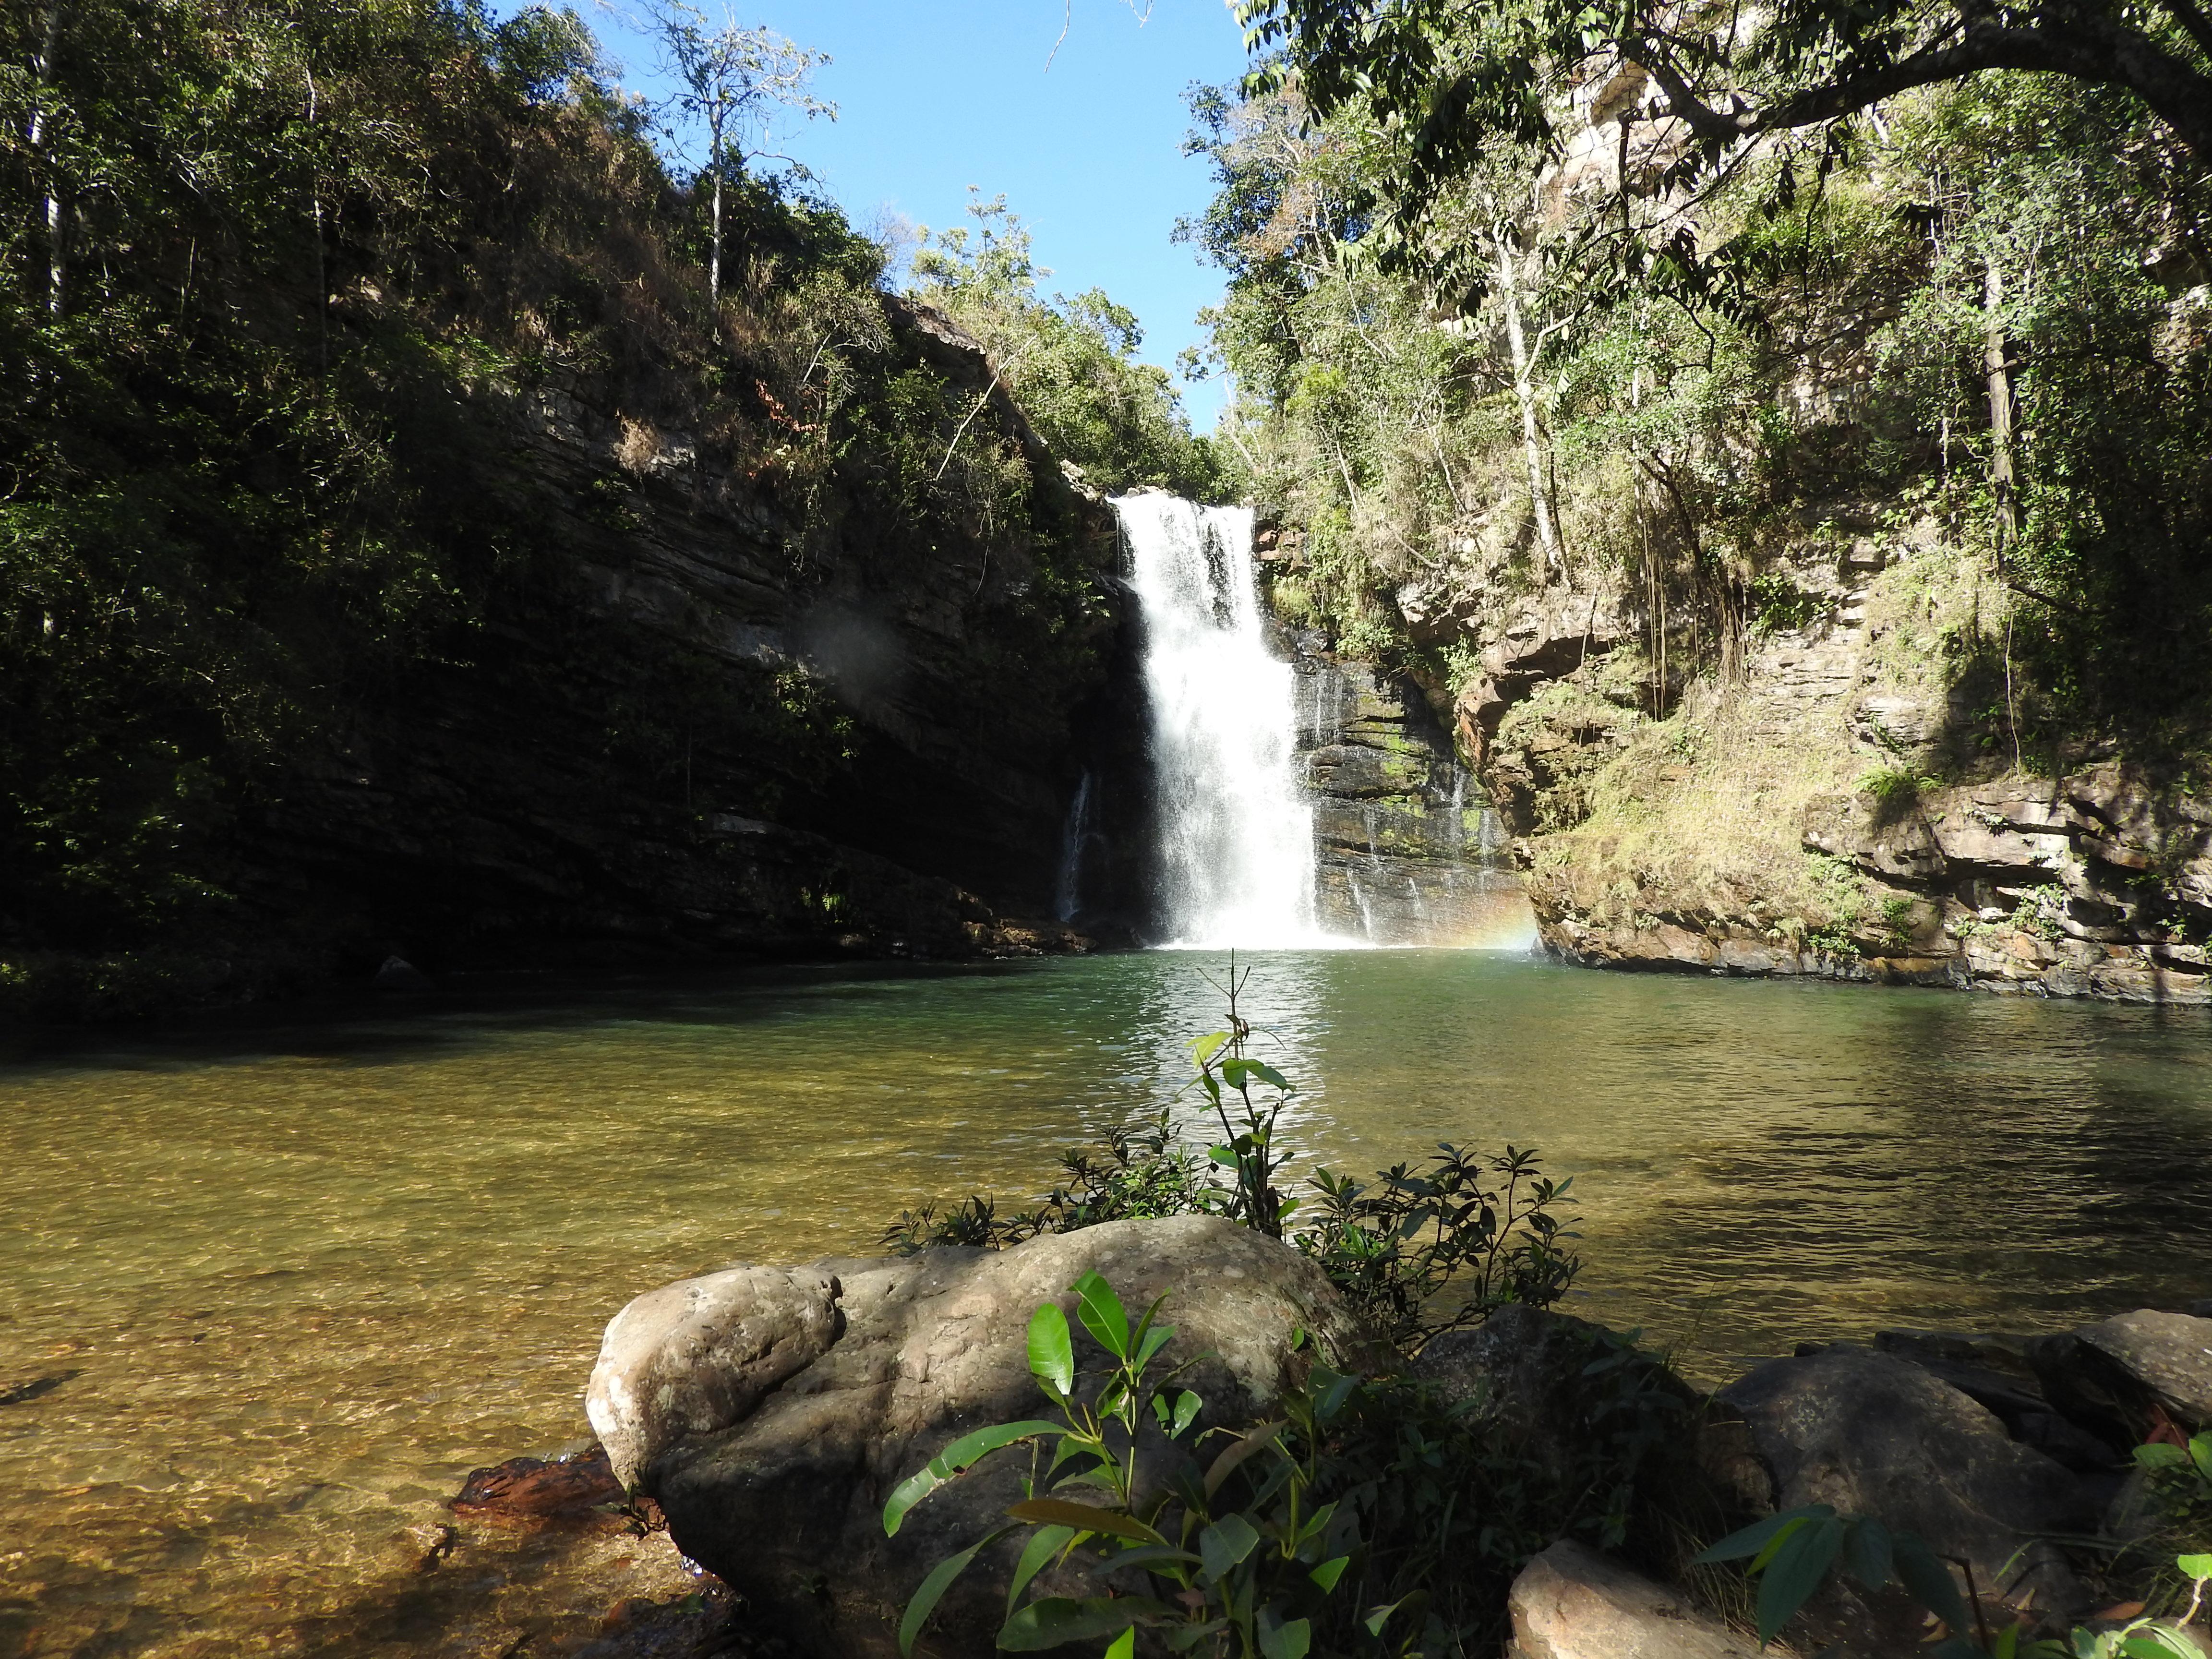 Da Cachoeira do Indaiá até o topo do Salto do Itiquira